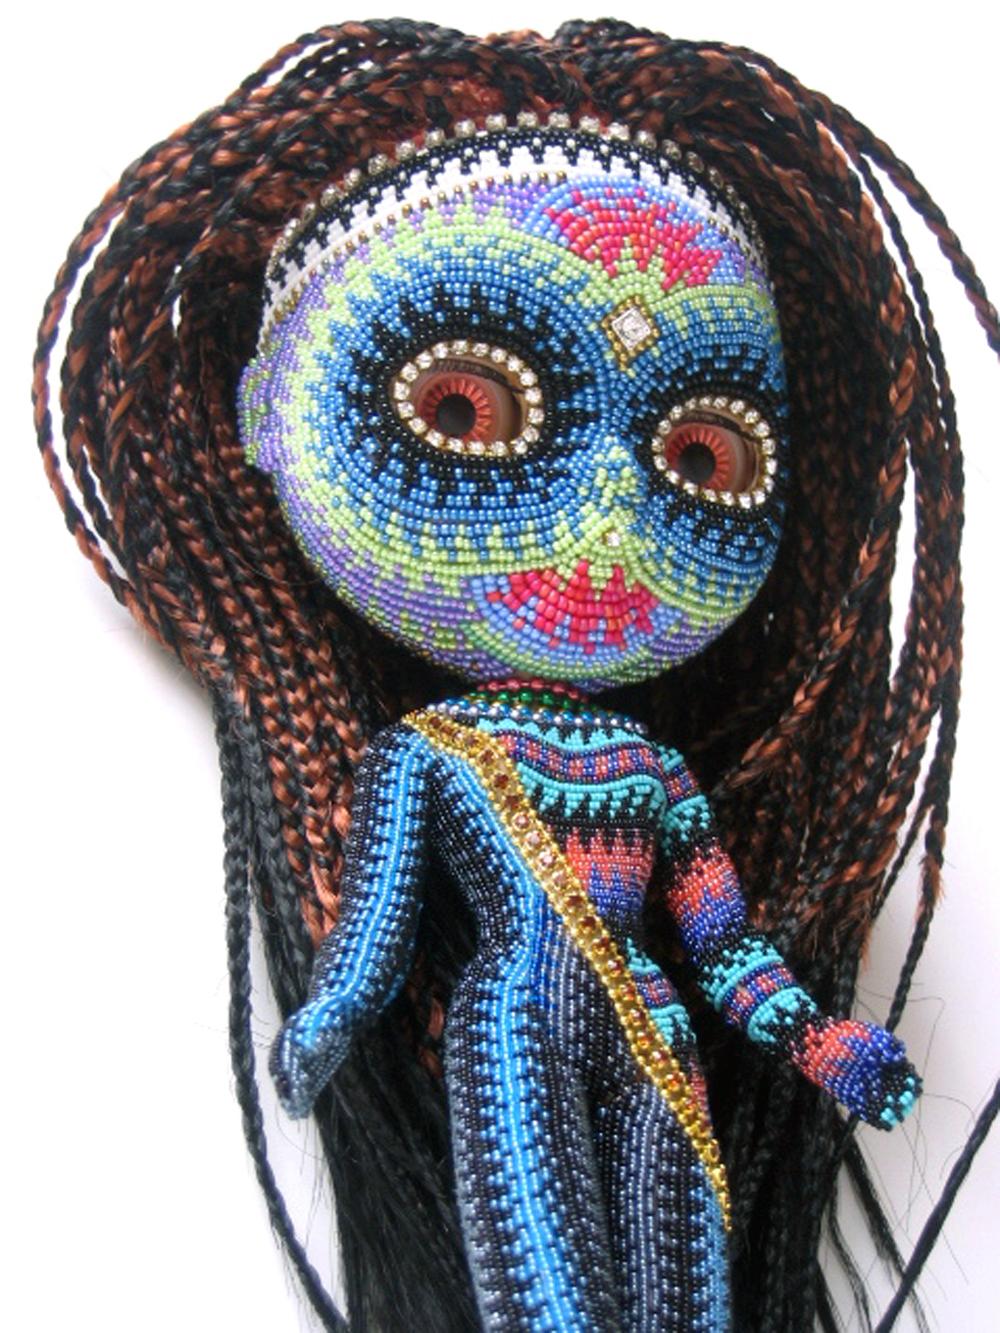 Jan Huling - Blythe (detail) - beadwork